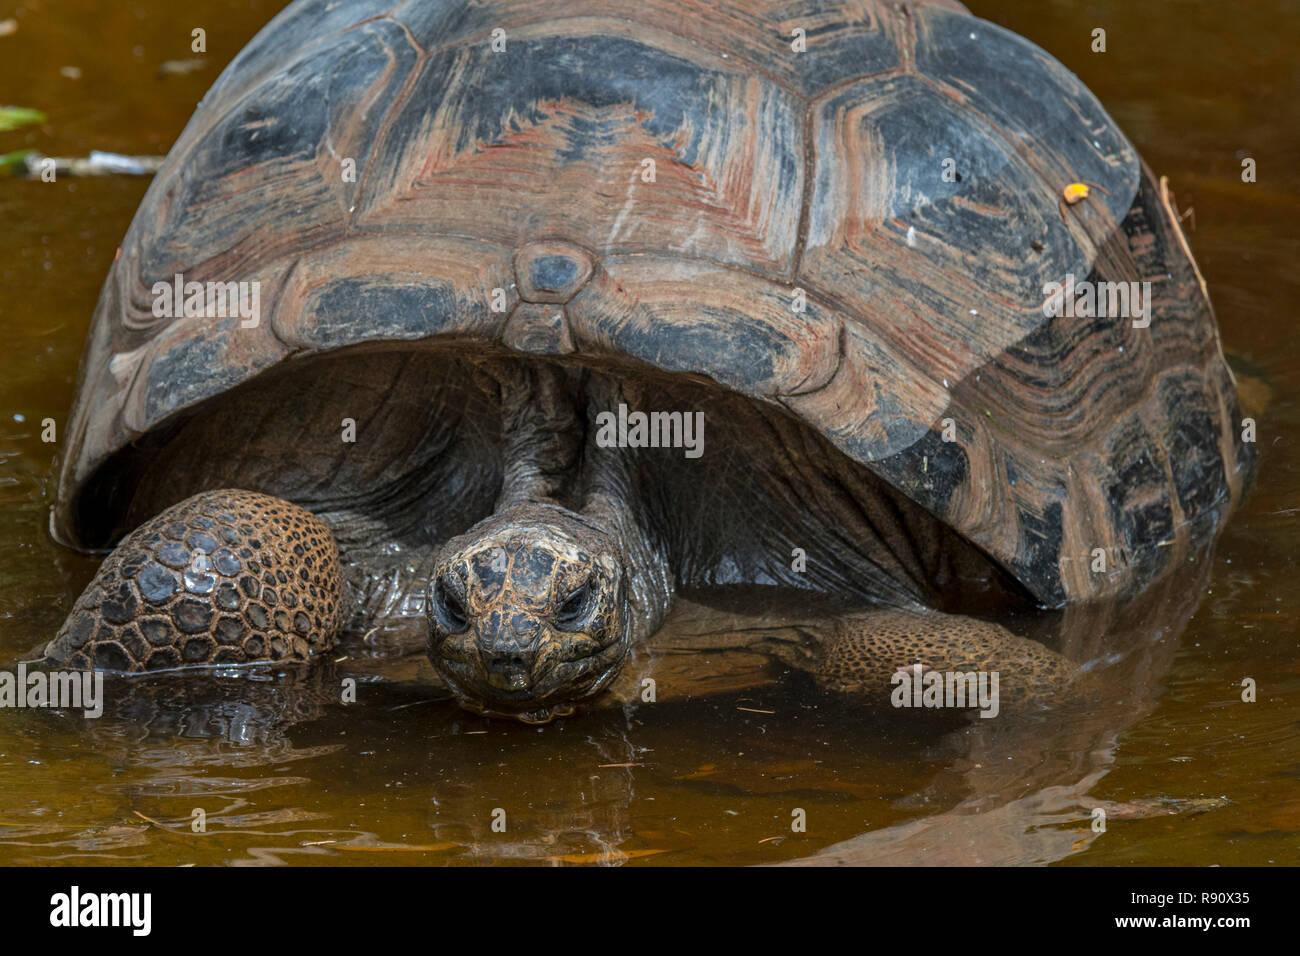 Aldabra giant tortoise (Aldabrachelys gigantea / Testudo gigantea) native to the islands of the Aldabra Atoll in the Seychelles - Stock Image